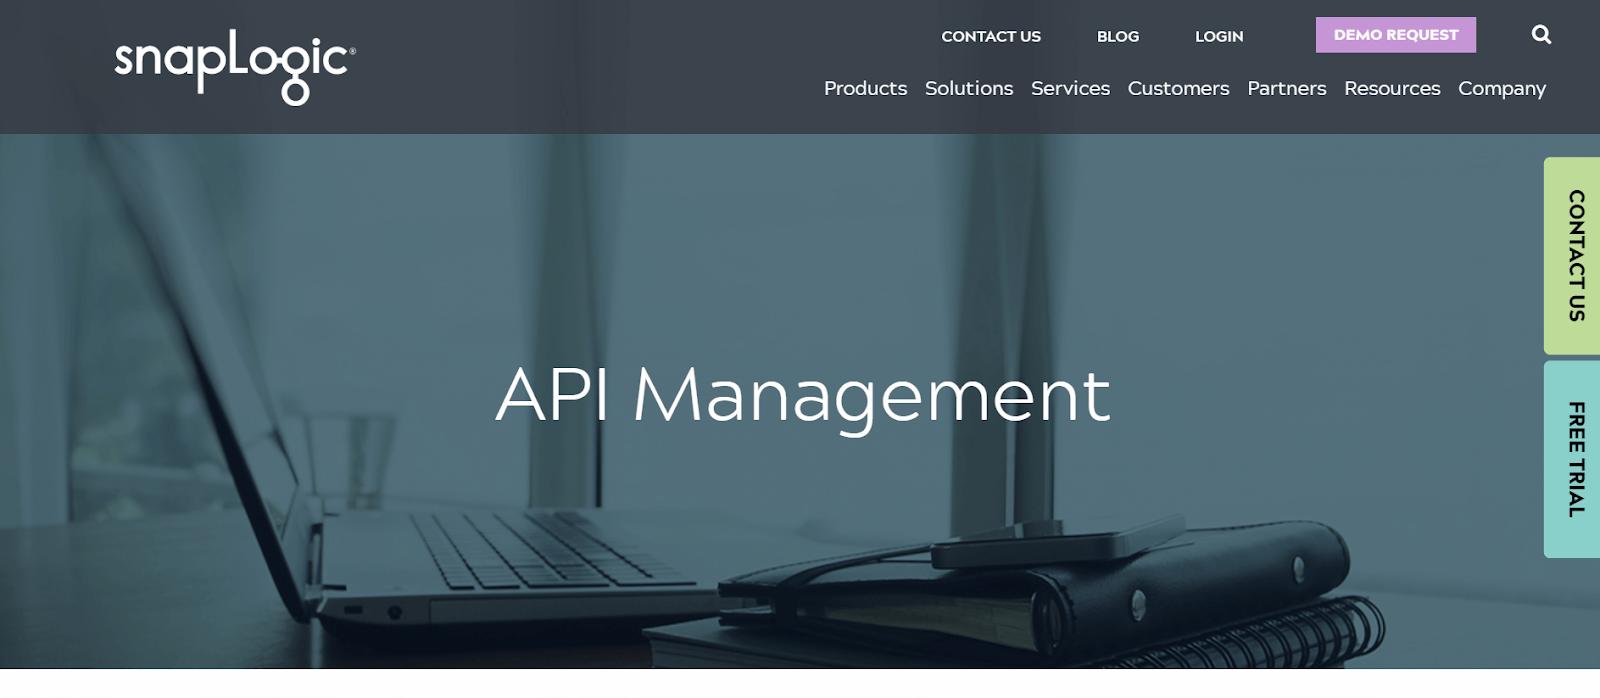 SnapLogic API Management Tools